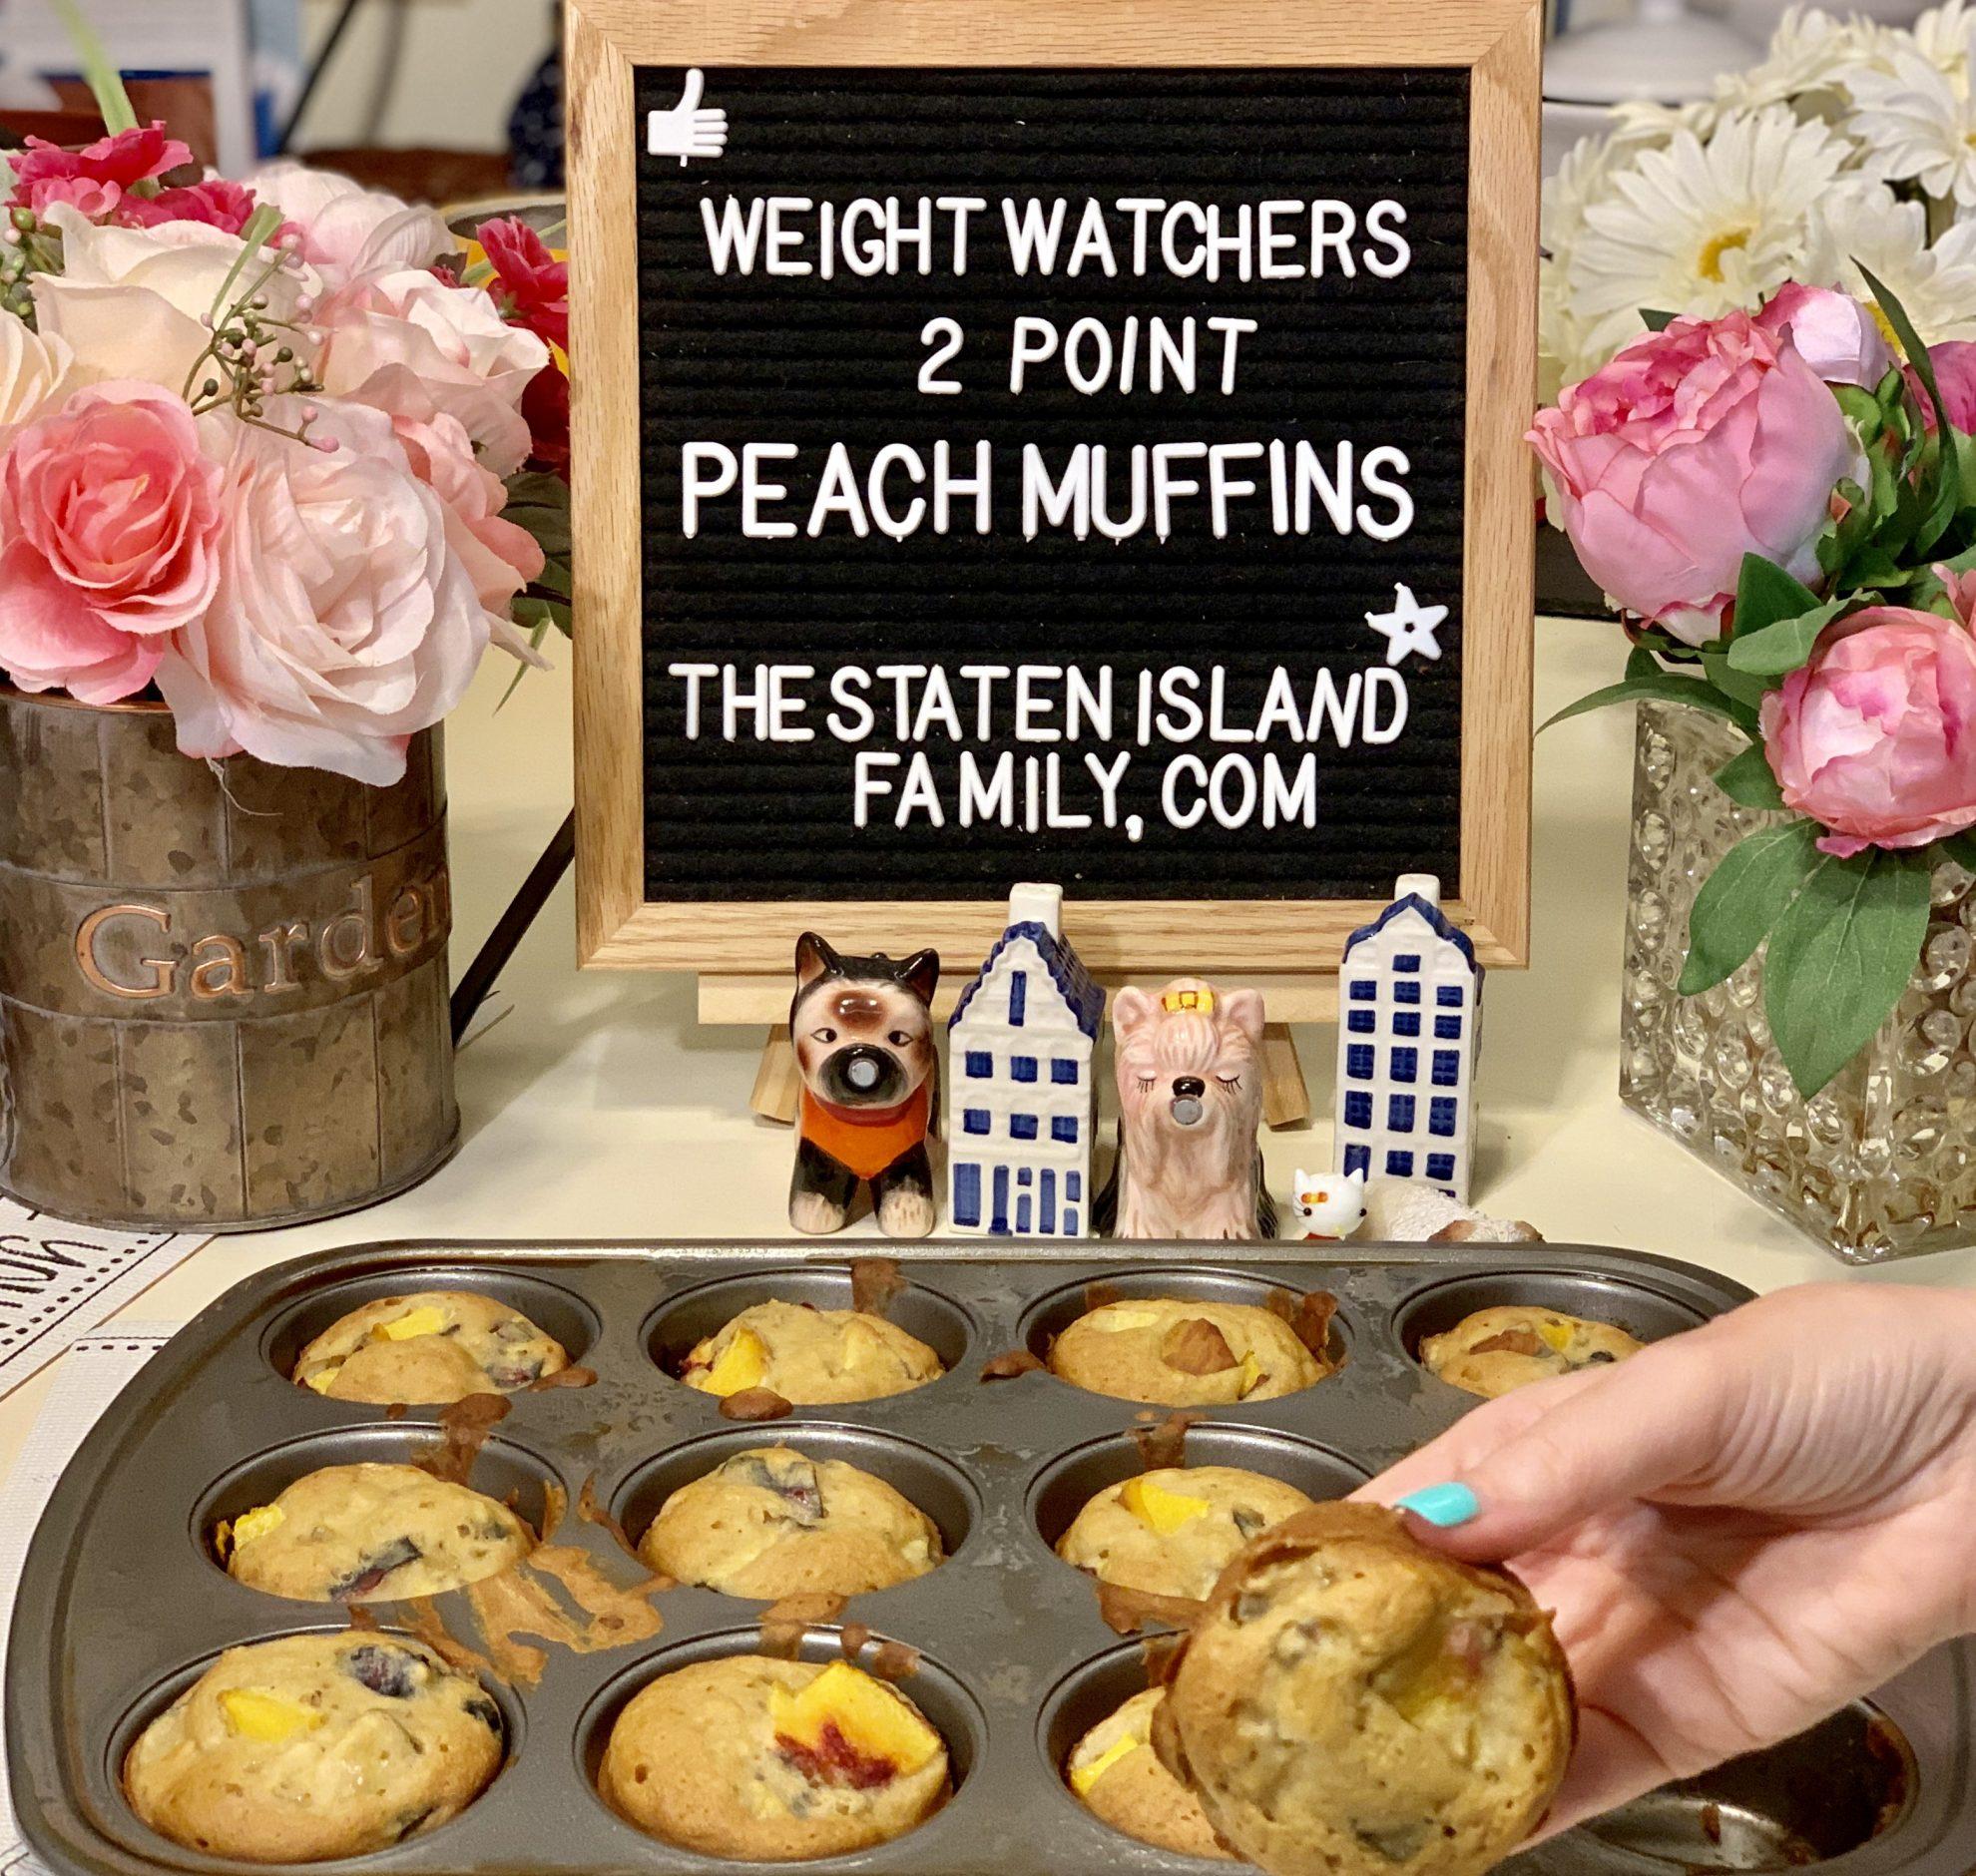 Weight Watchers Peach Muffin Recipe